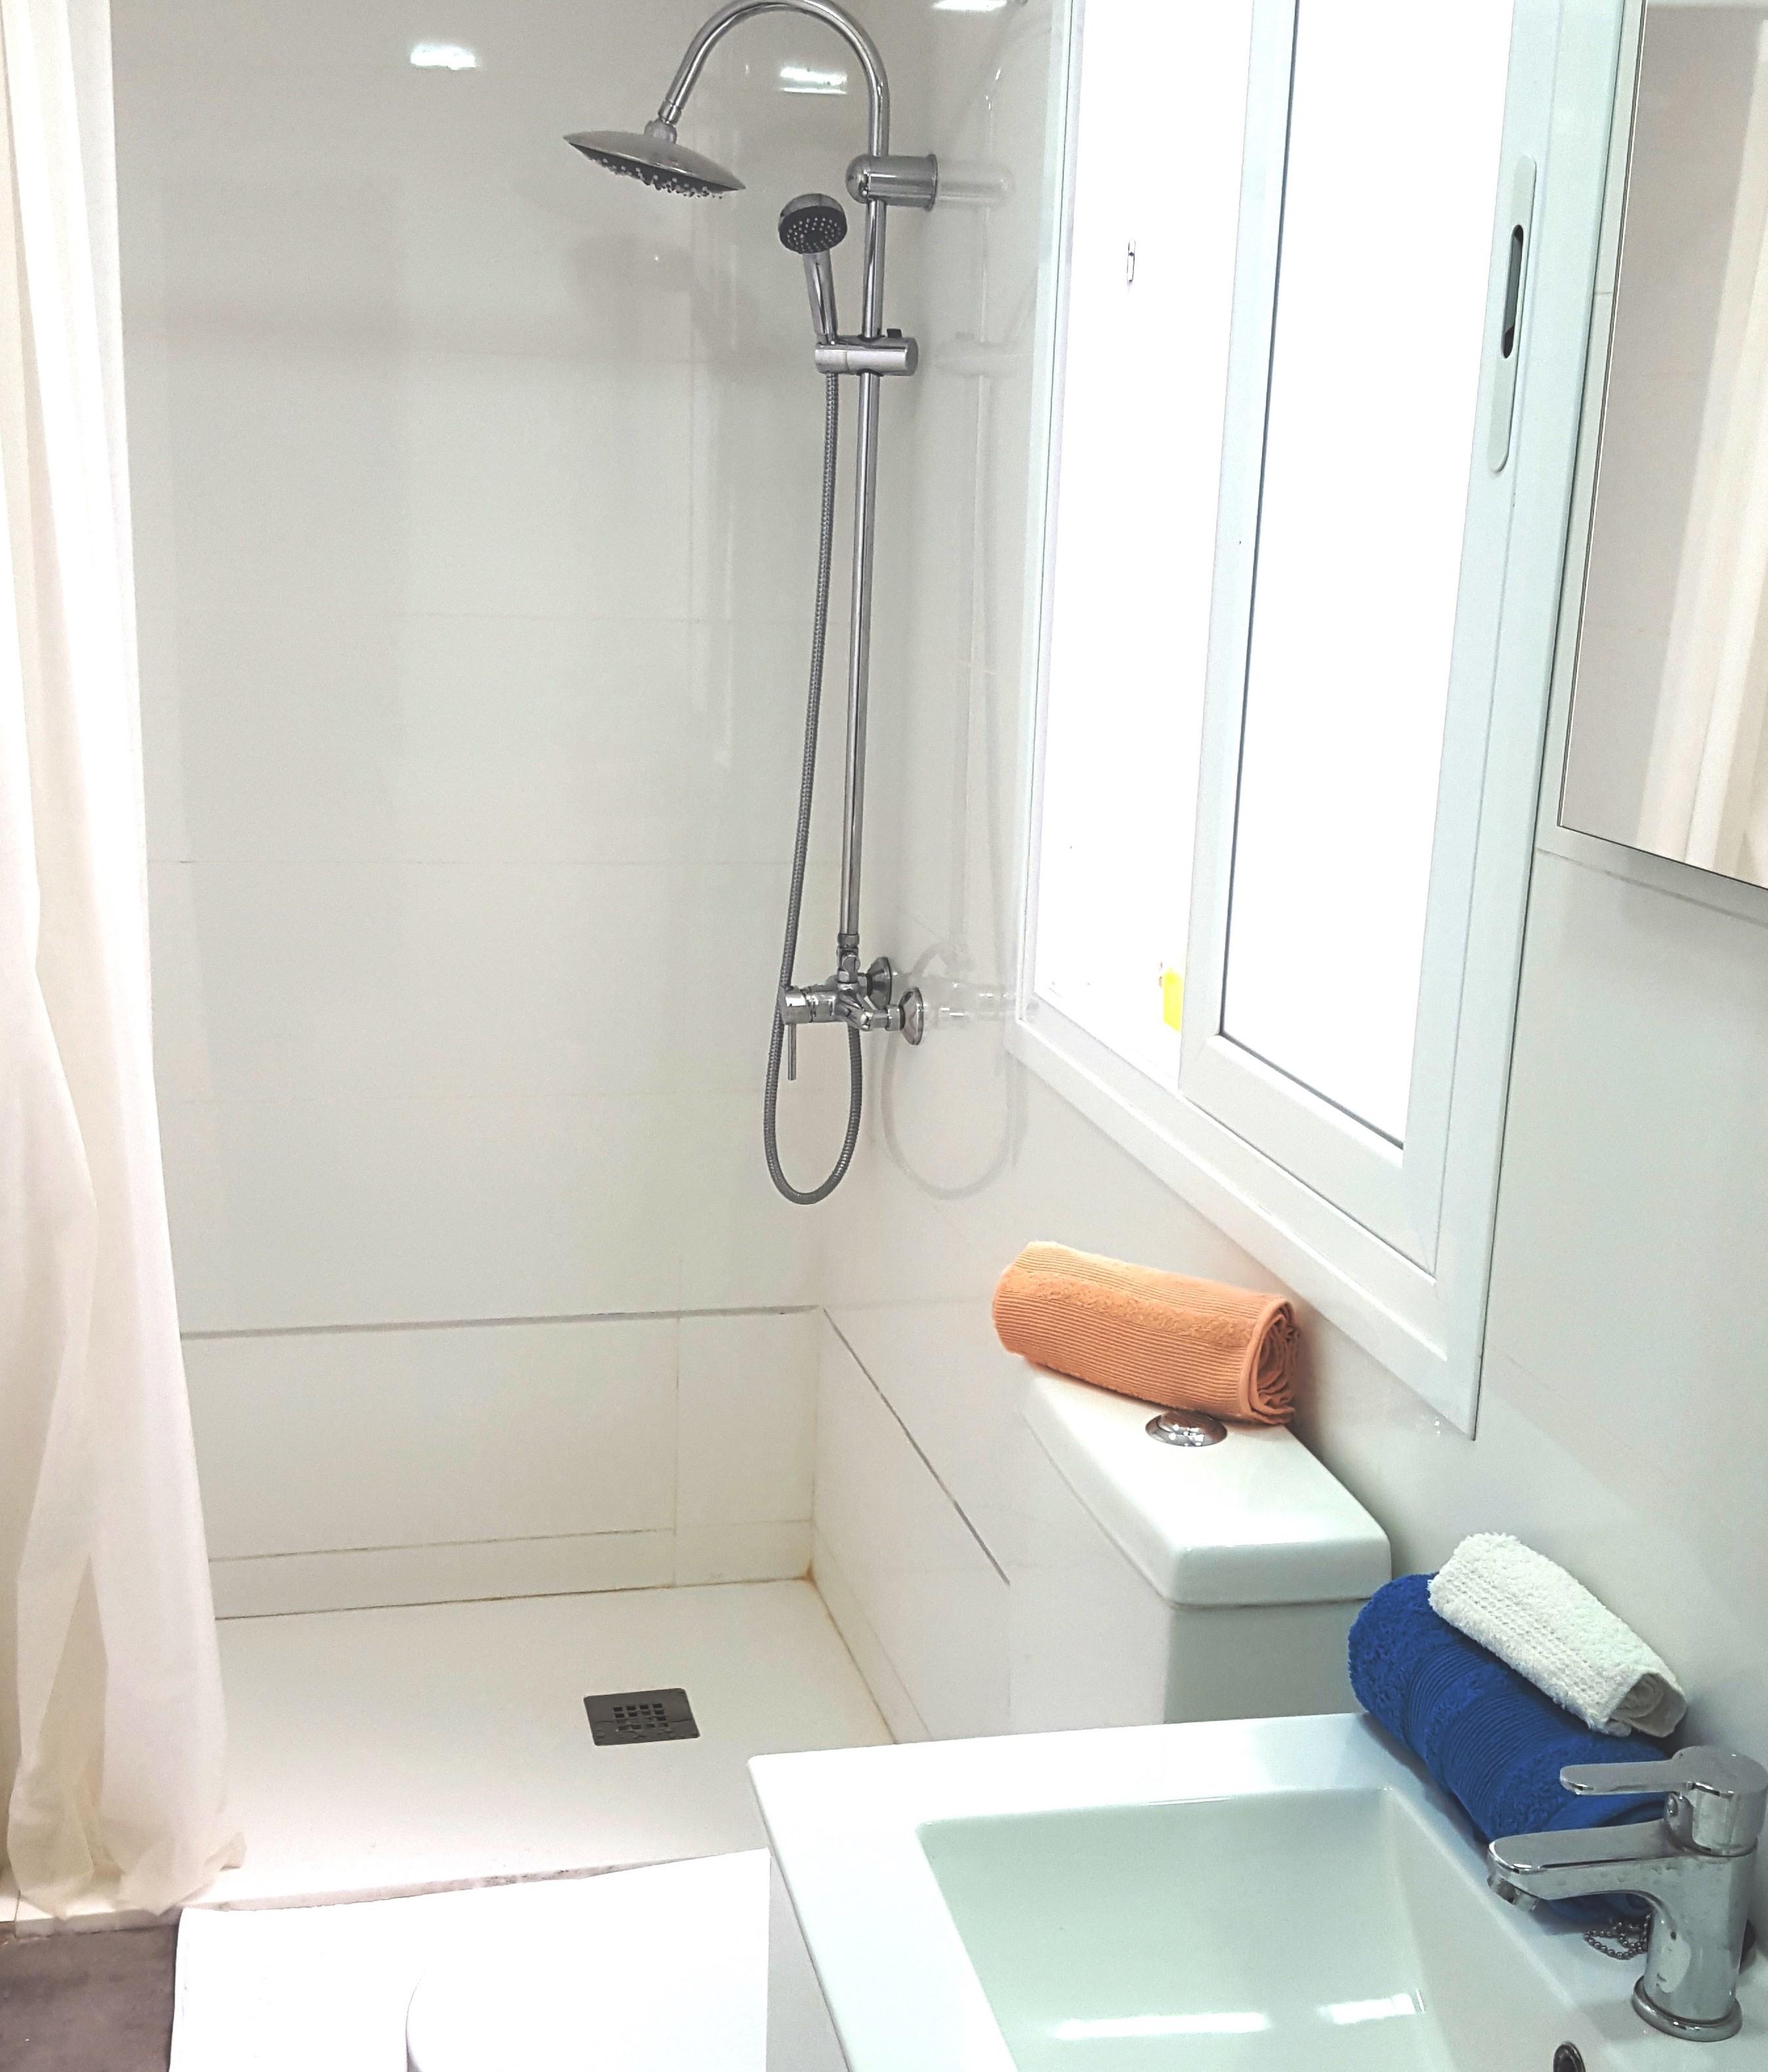 Baño, ducha grande